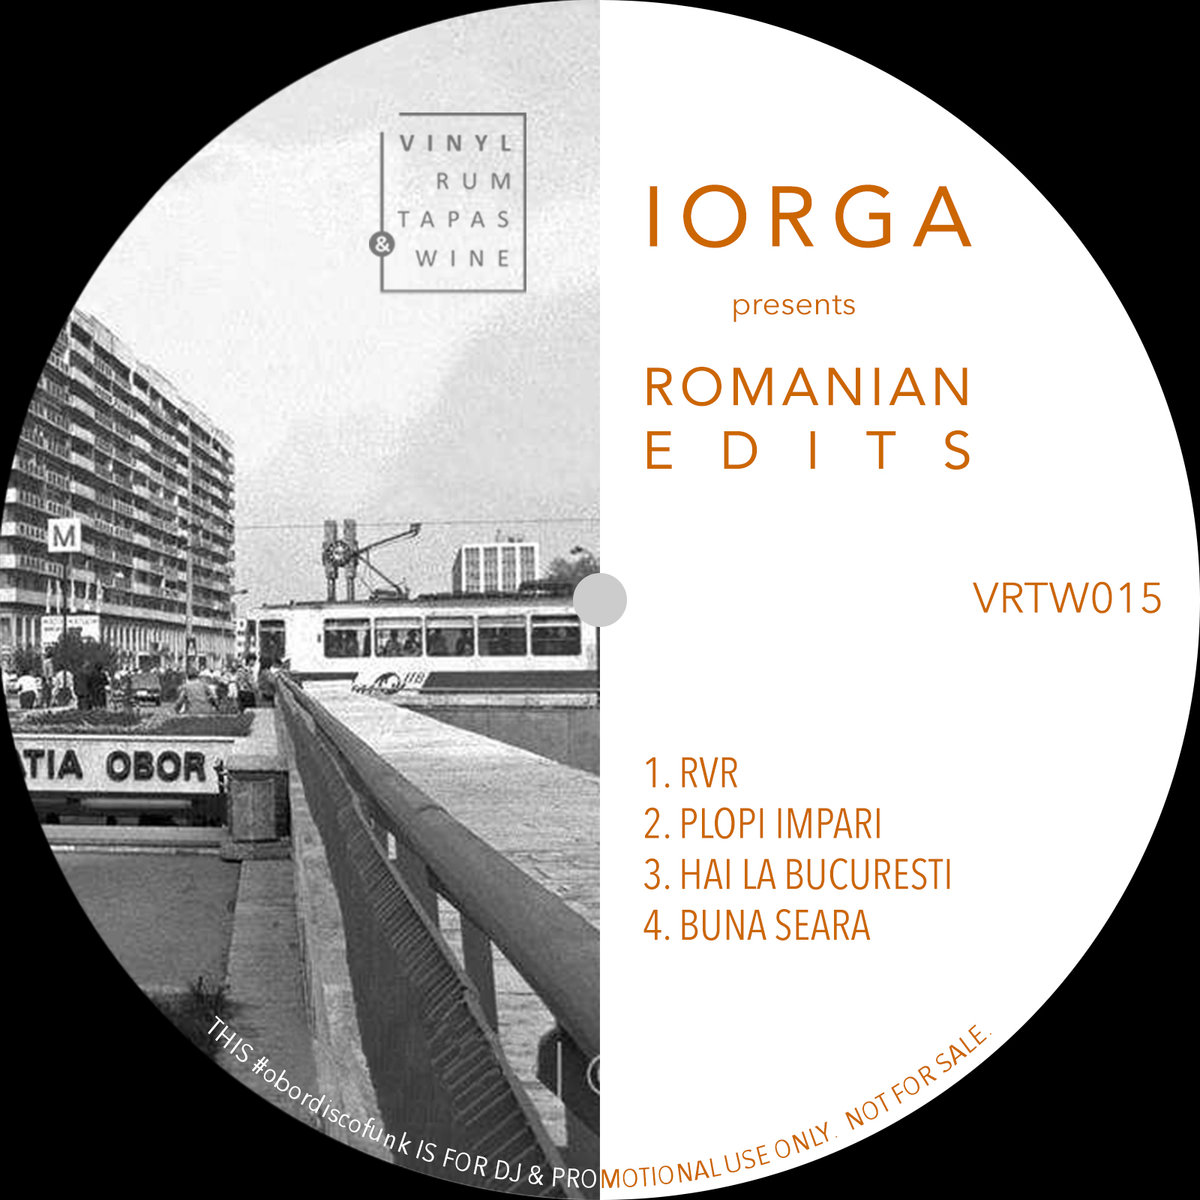 Iorga - Romanian Edits - VRTW